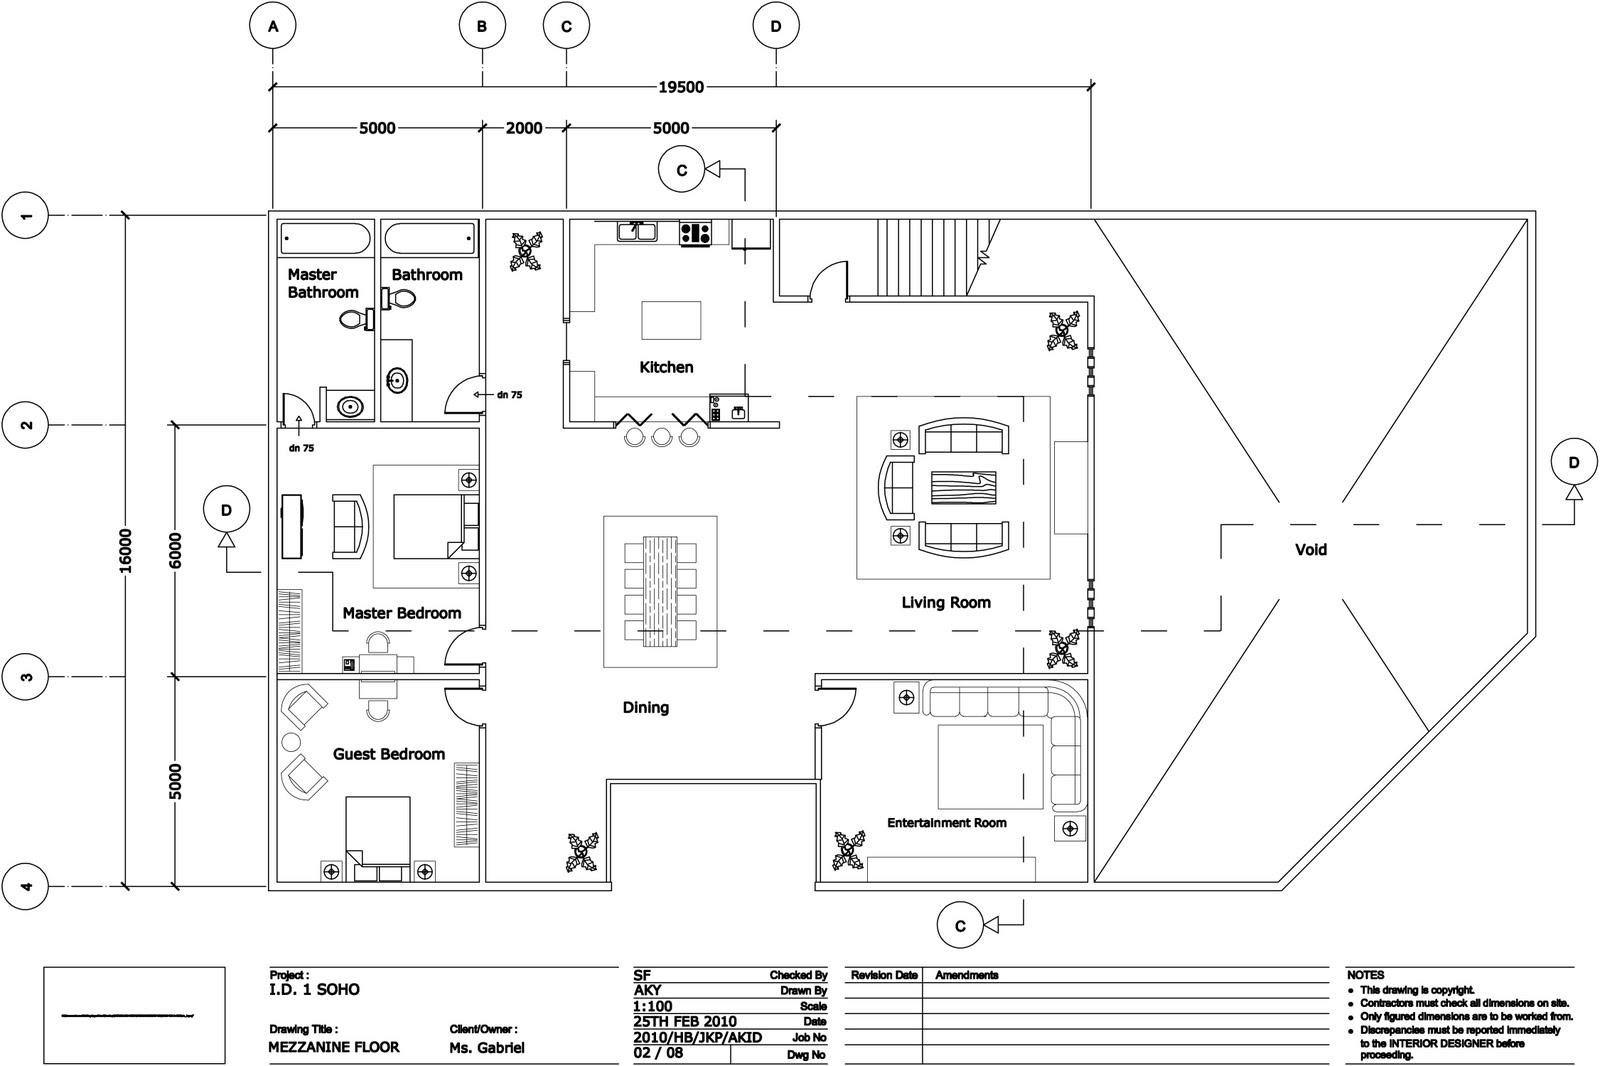 Free Office Floor Plan: Quantum1980: Interior Design 1 : SoHo (Small Office Home